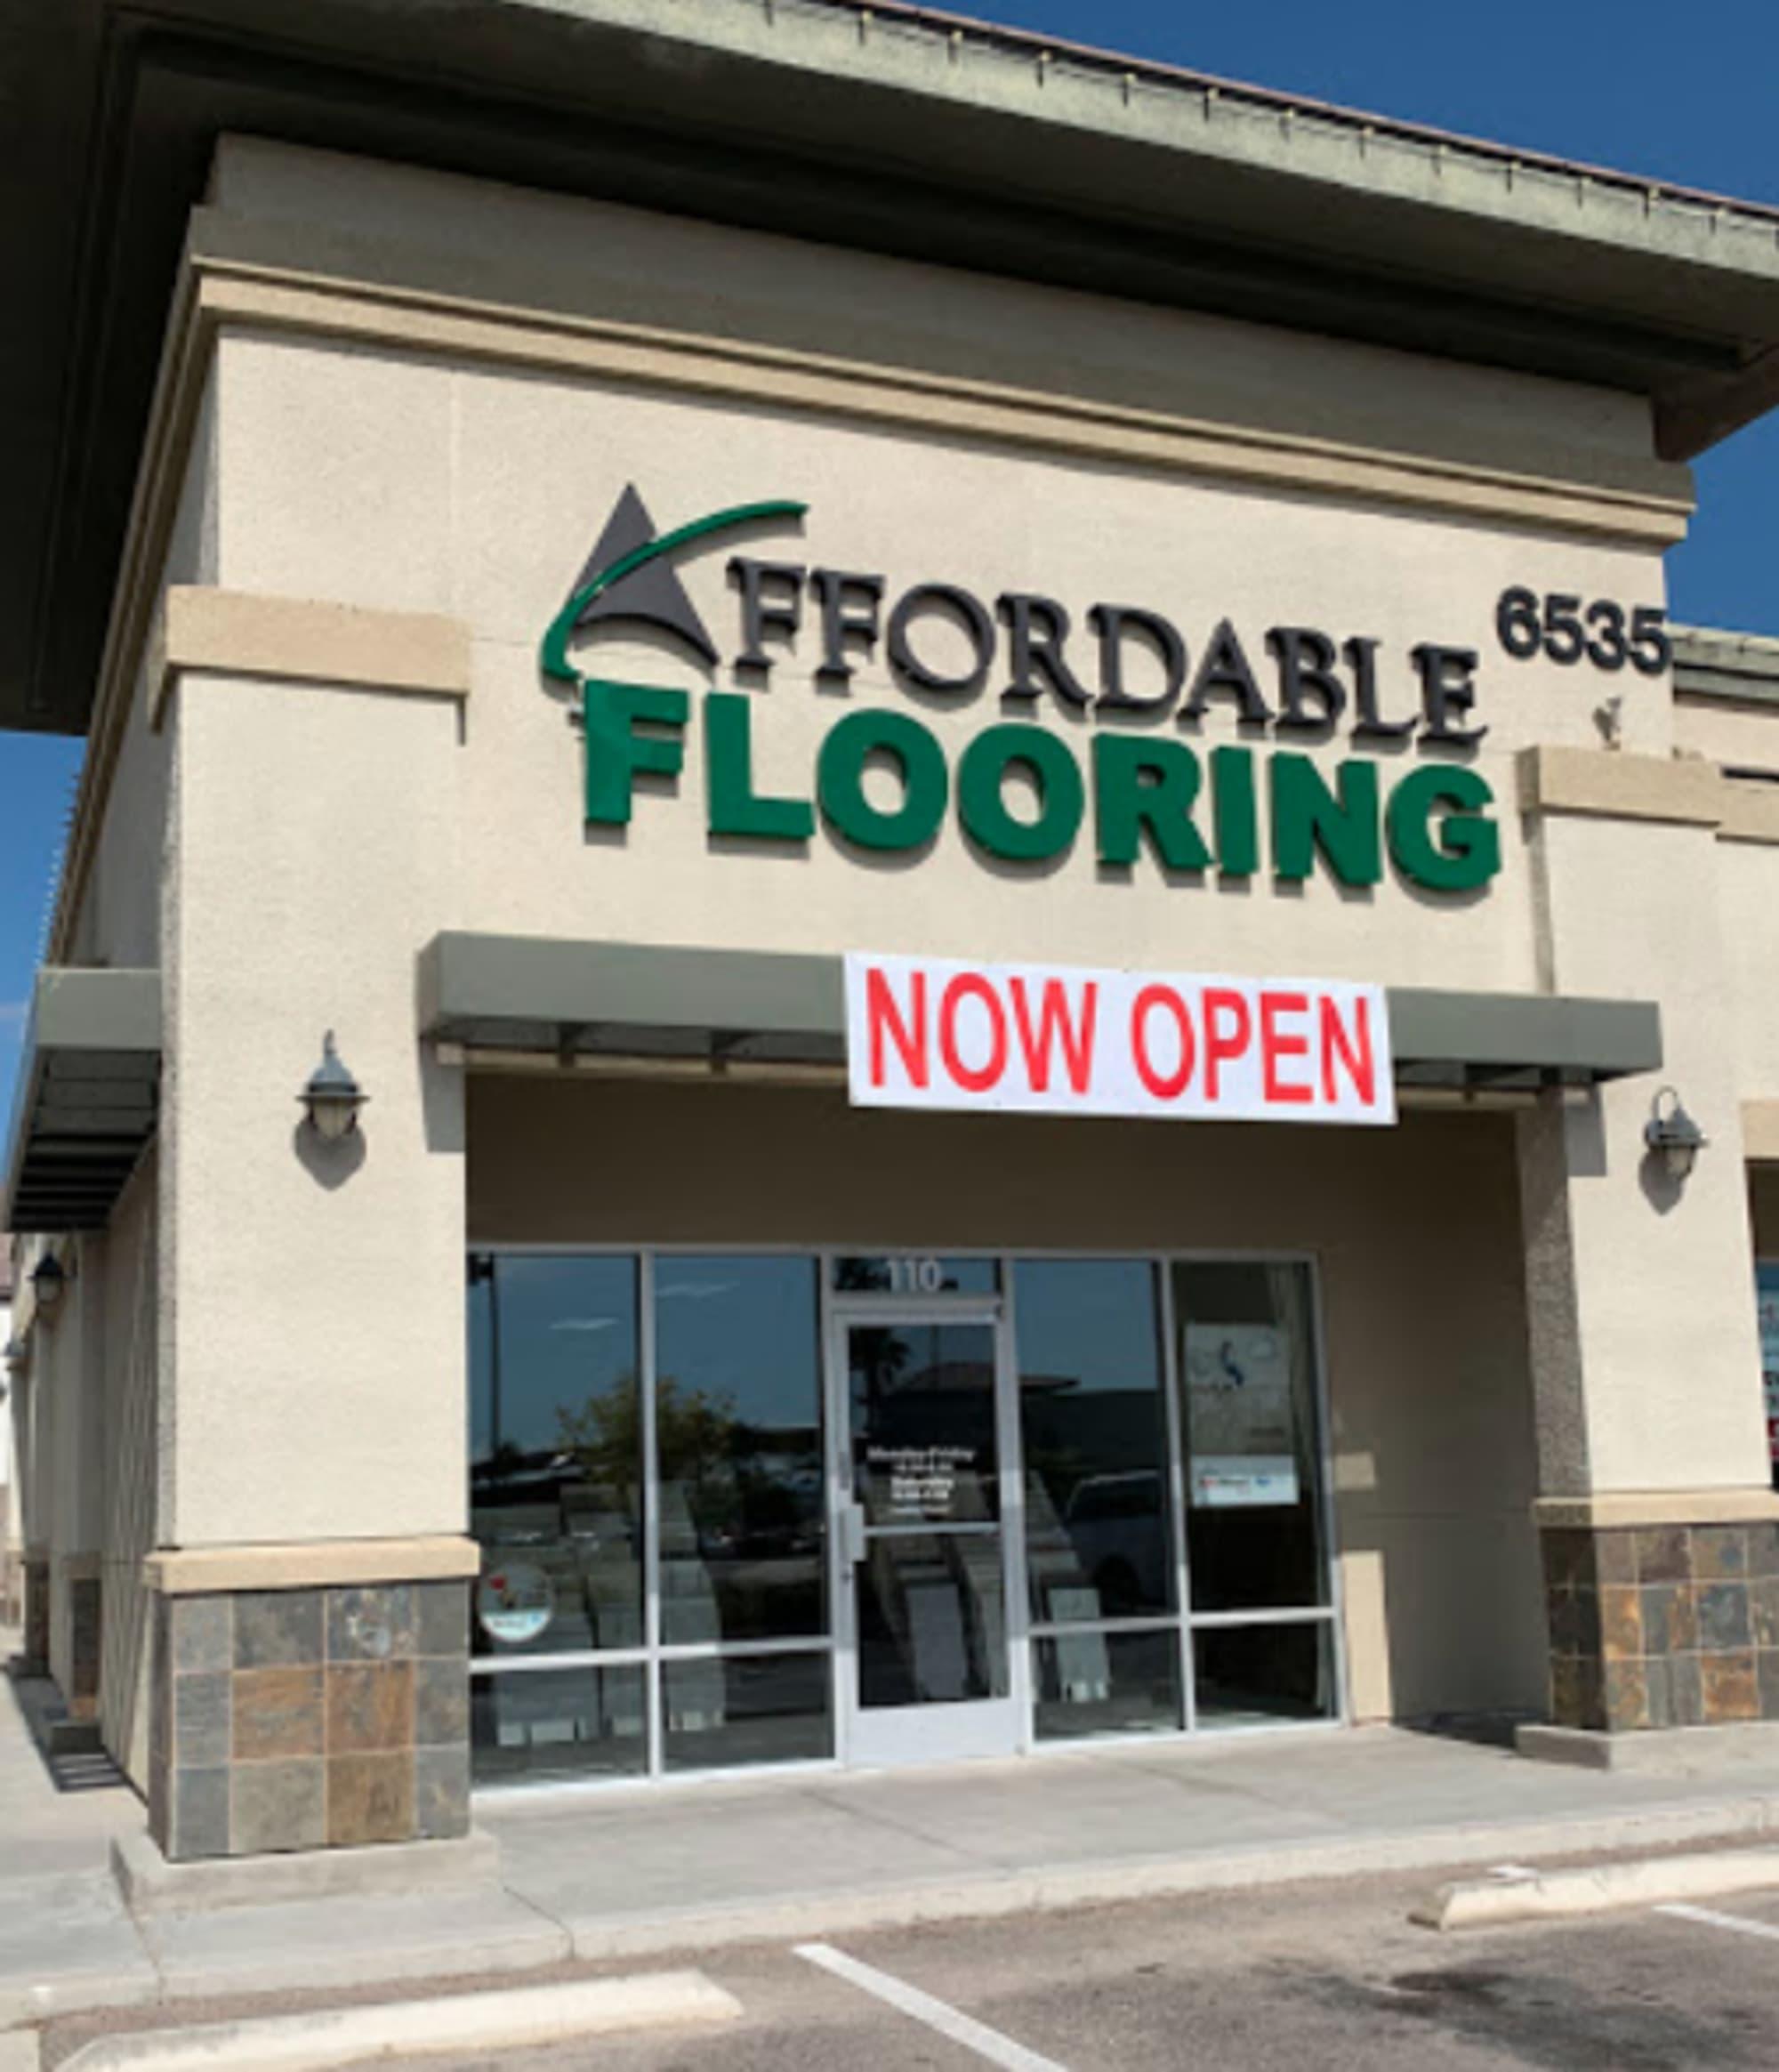 Affordable Flooring & More - 6535 N Buffalo Dr #110 Las Vegas, NV 89131